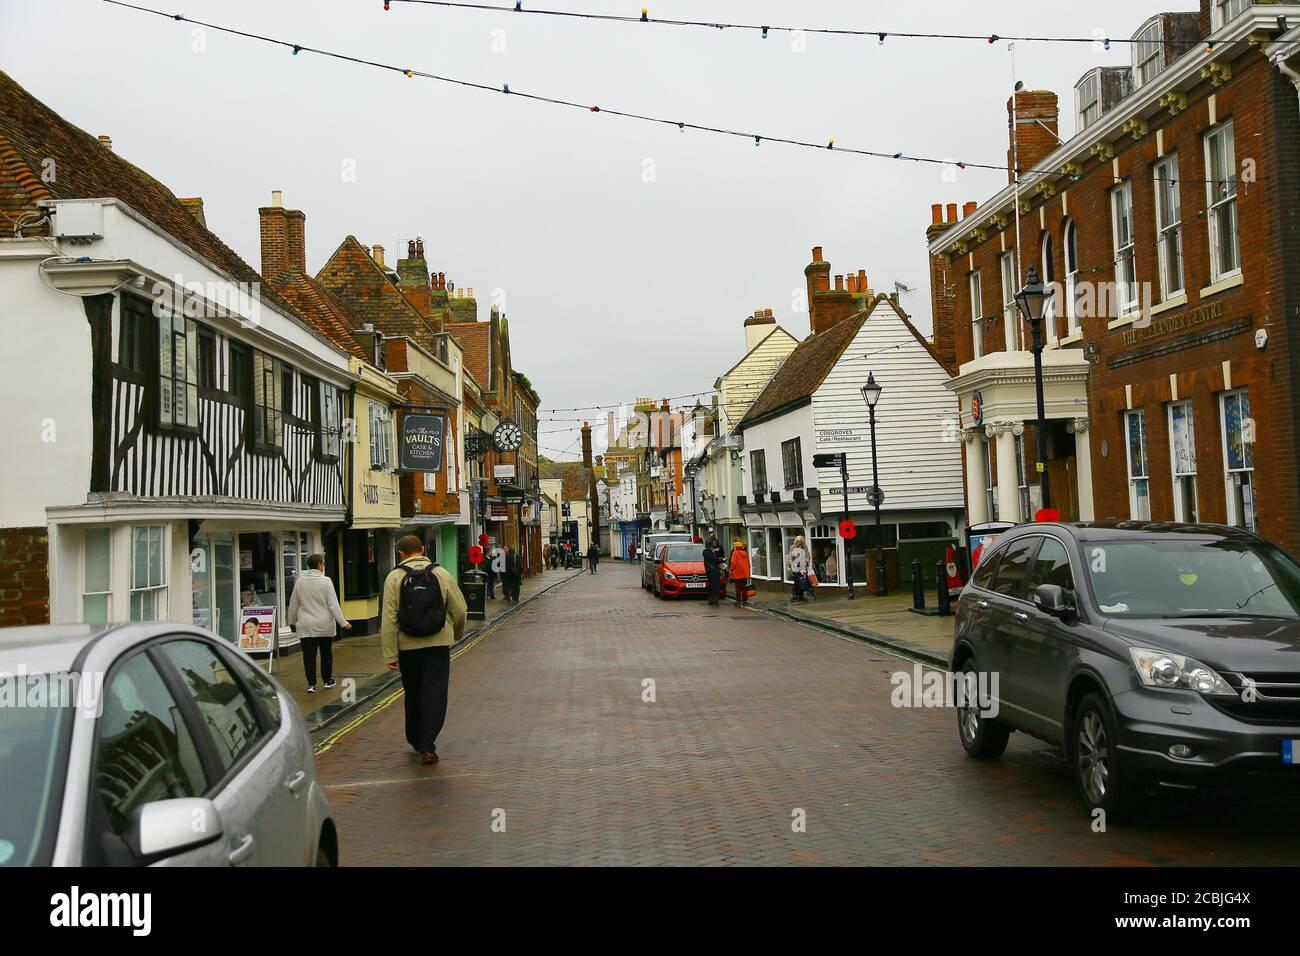 Faversham in Kent, typical British High Street. Stock Photo